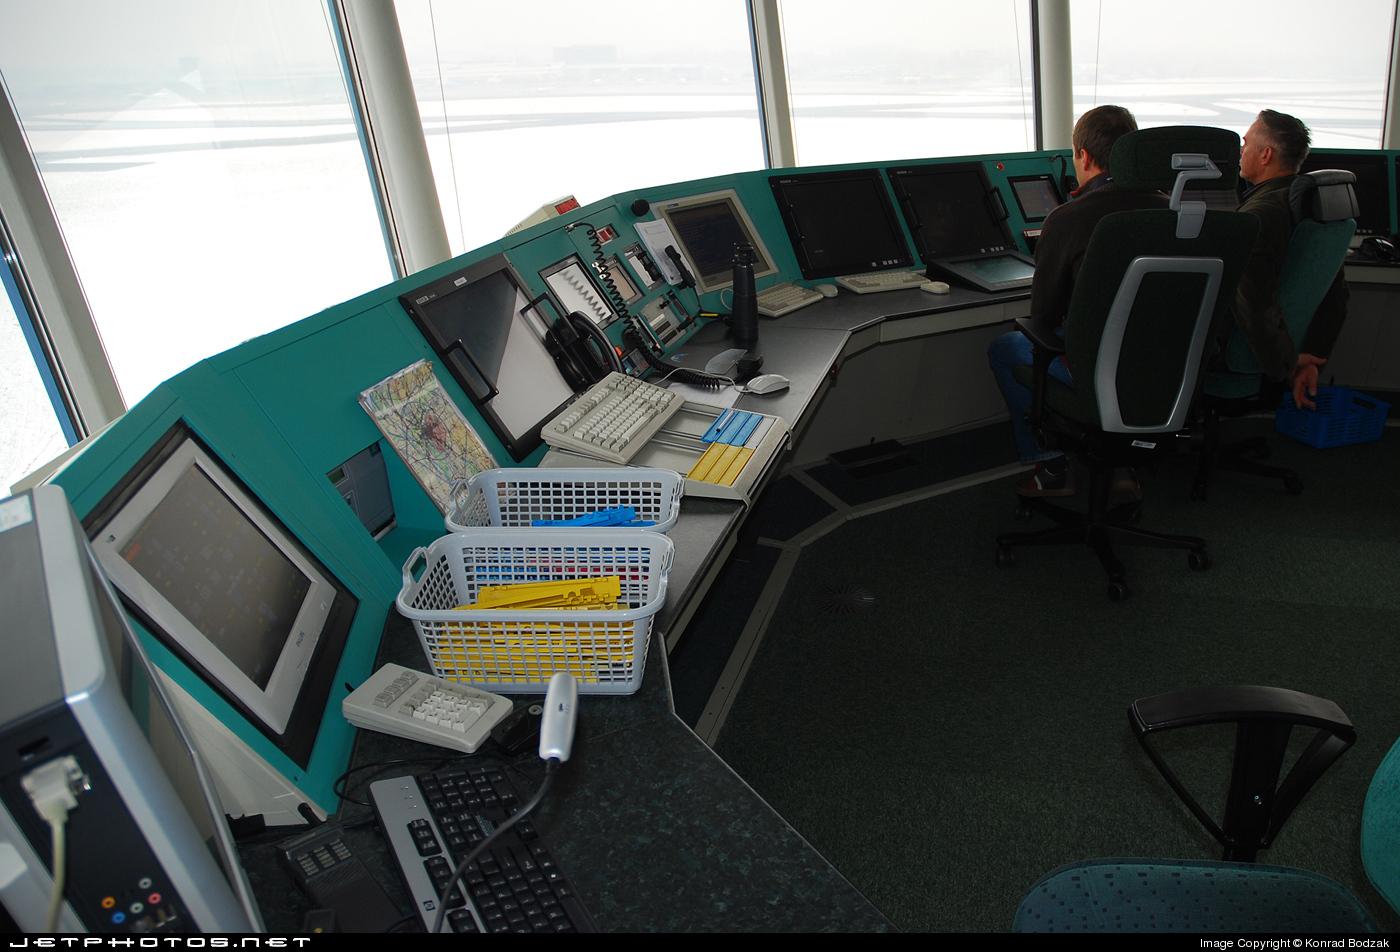 EPWA - Airport - Control Tower